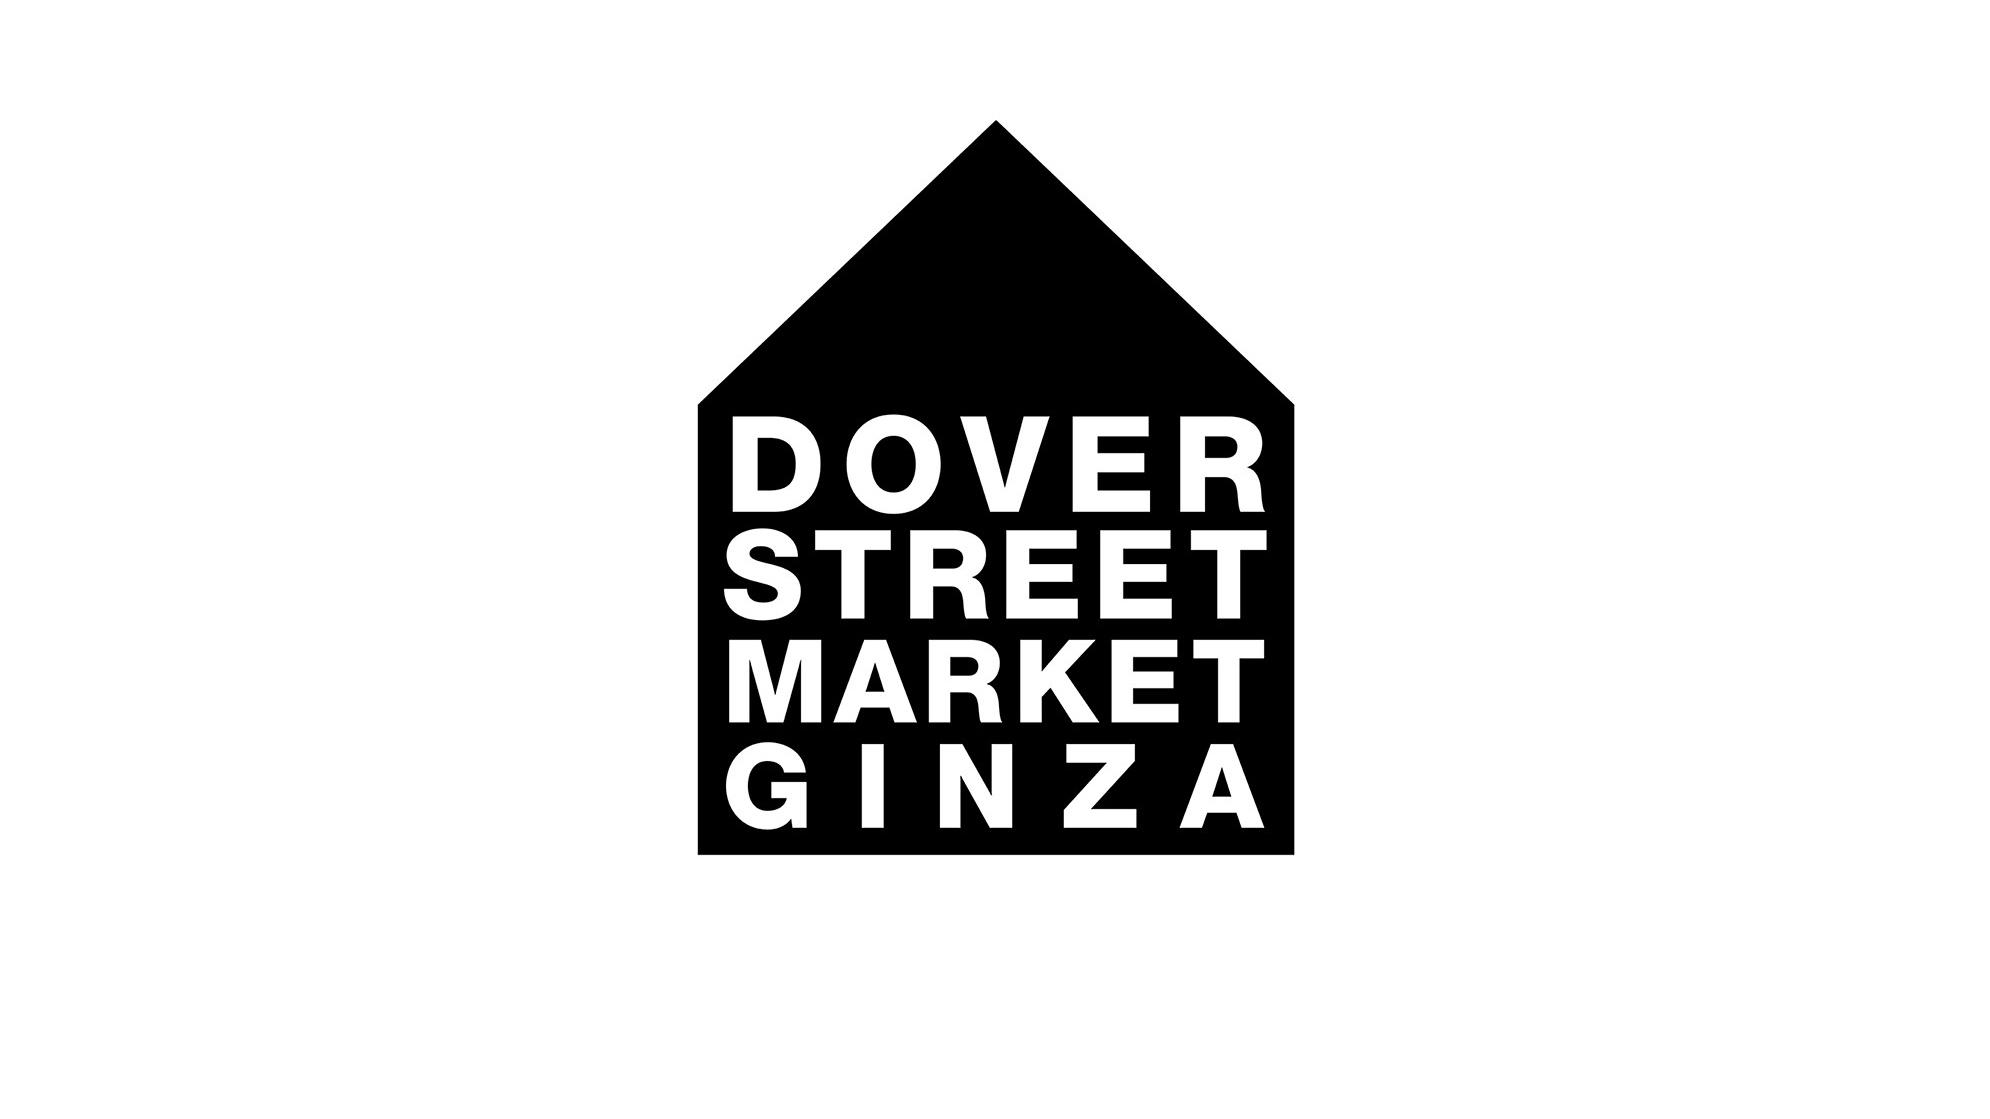 DOVER STREET MARKET GINZA 販売職 (21卒)のカバー写真